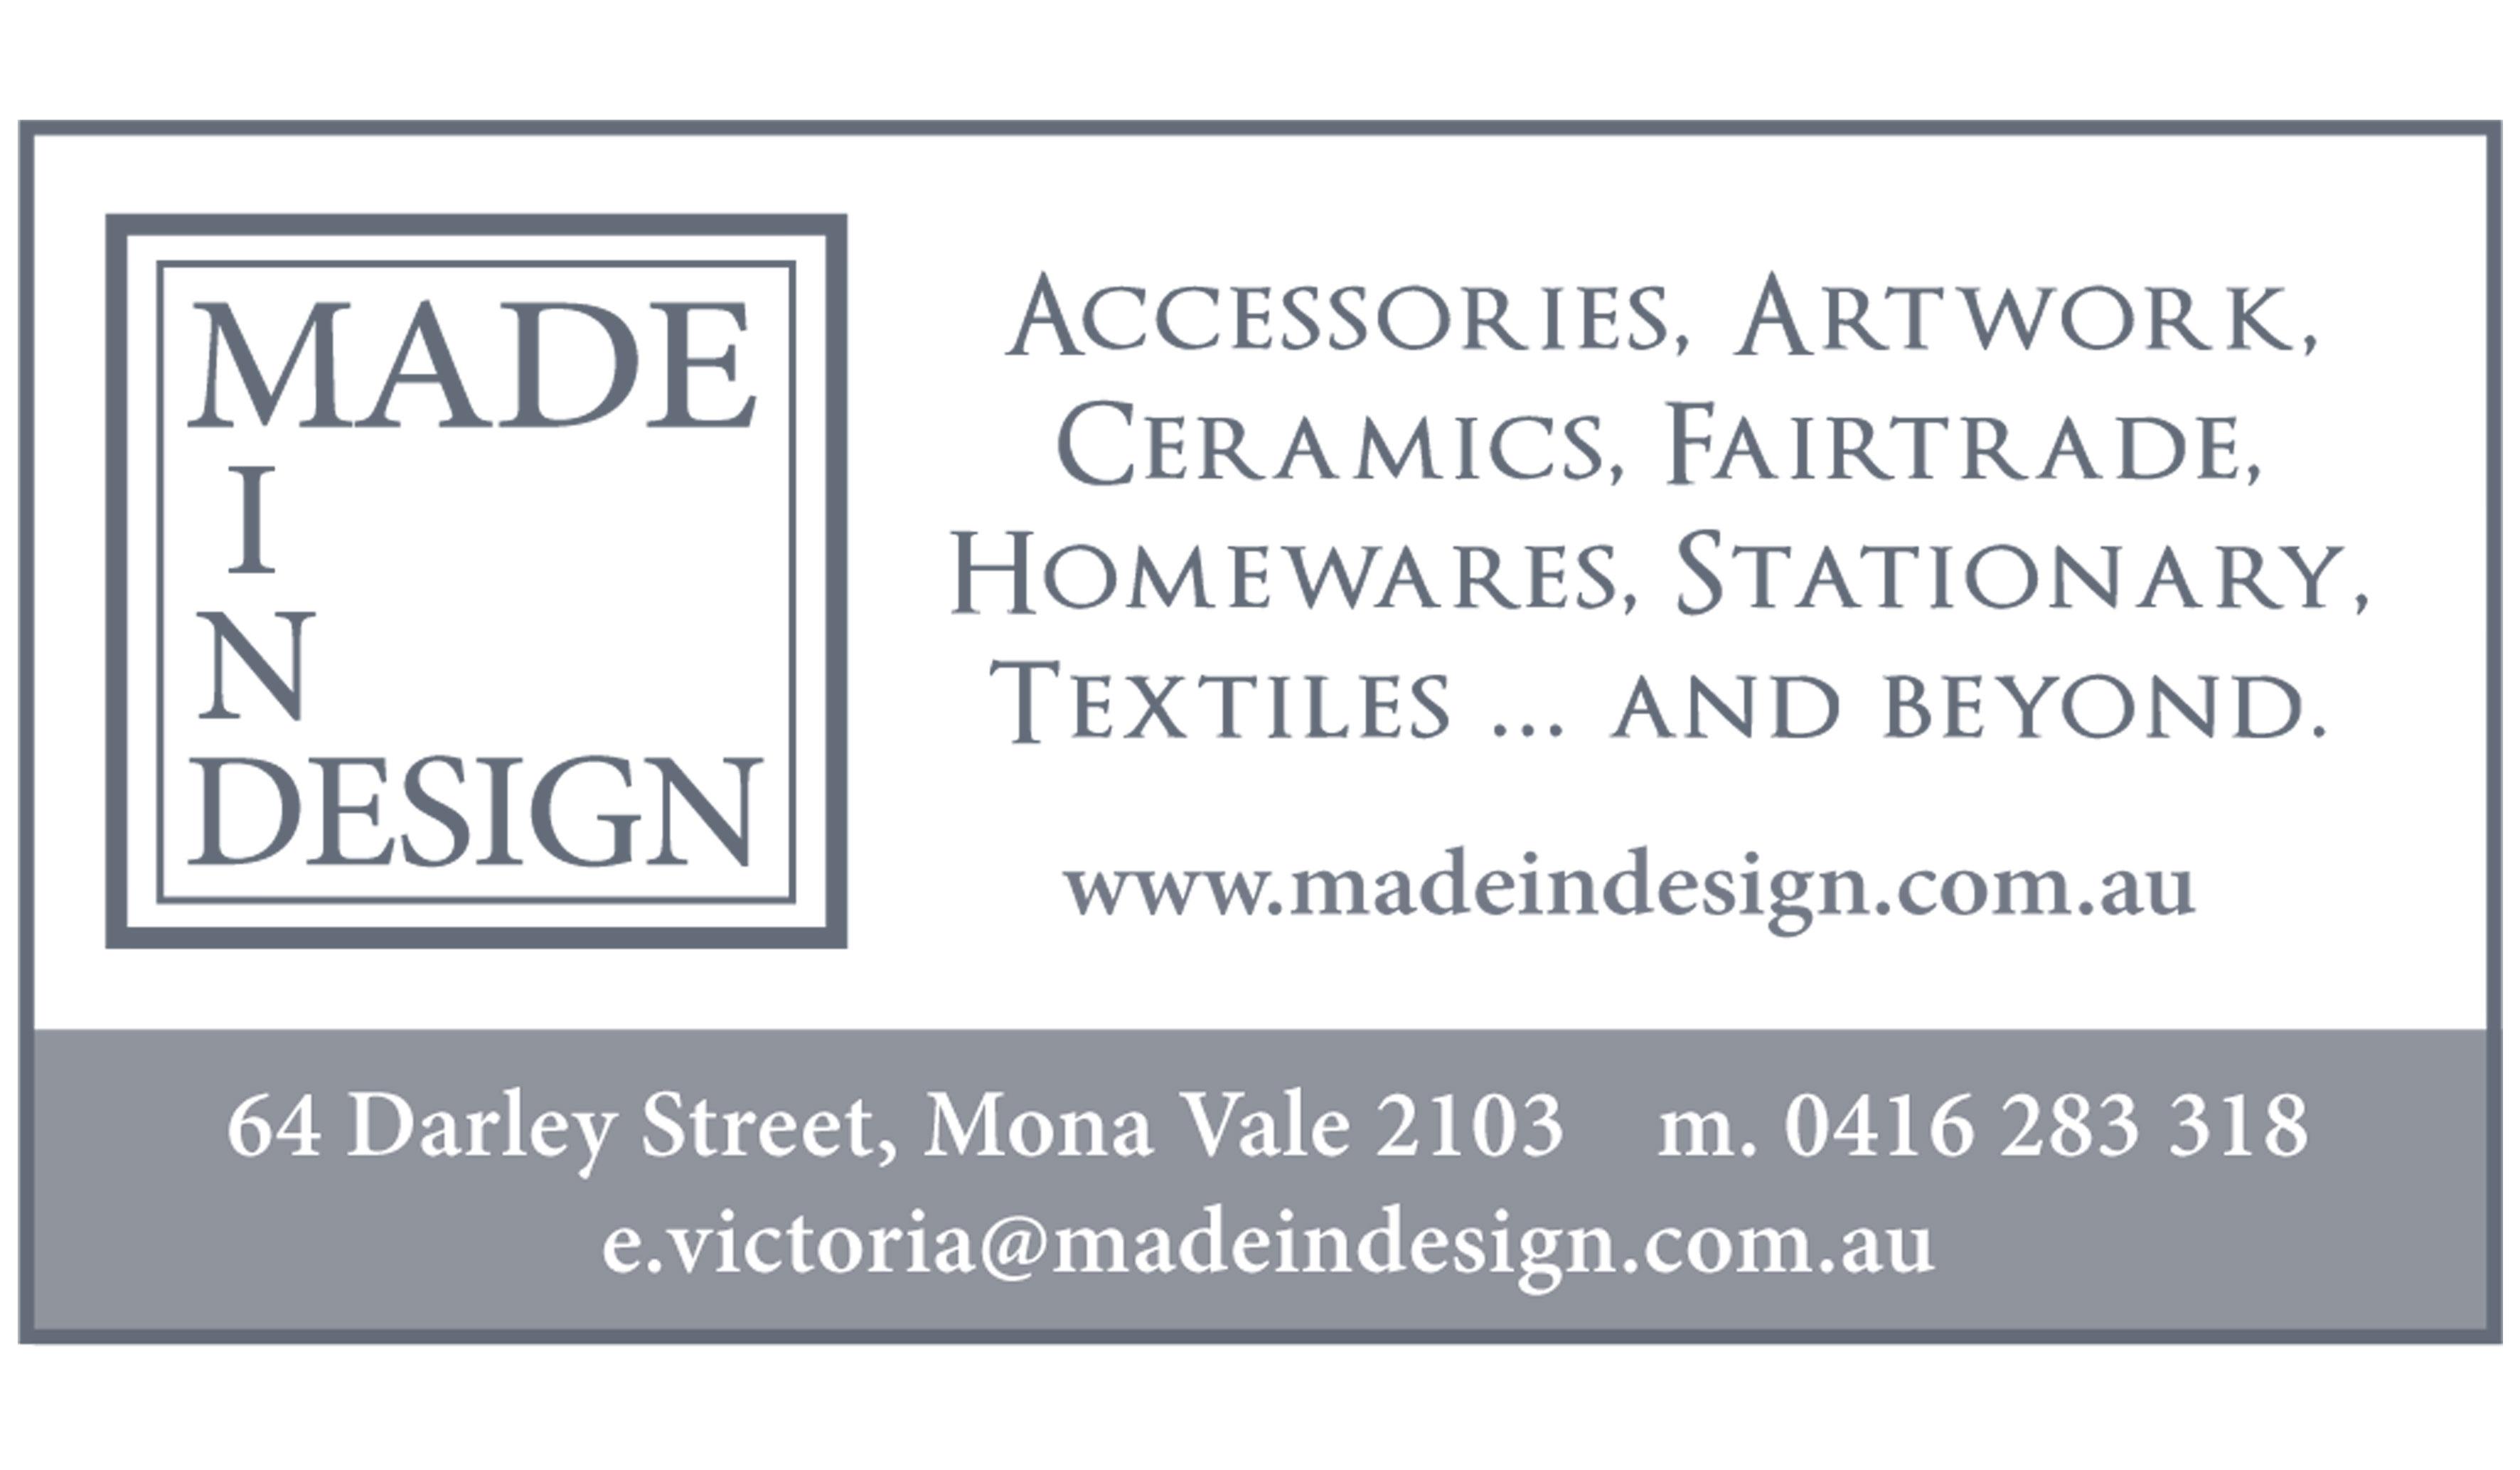 Vicki Ratcliff Artist Pittwater Artists Trail Madein Design Advert Image